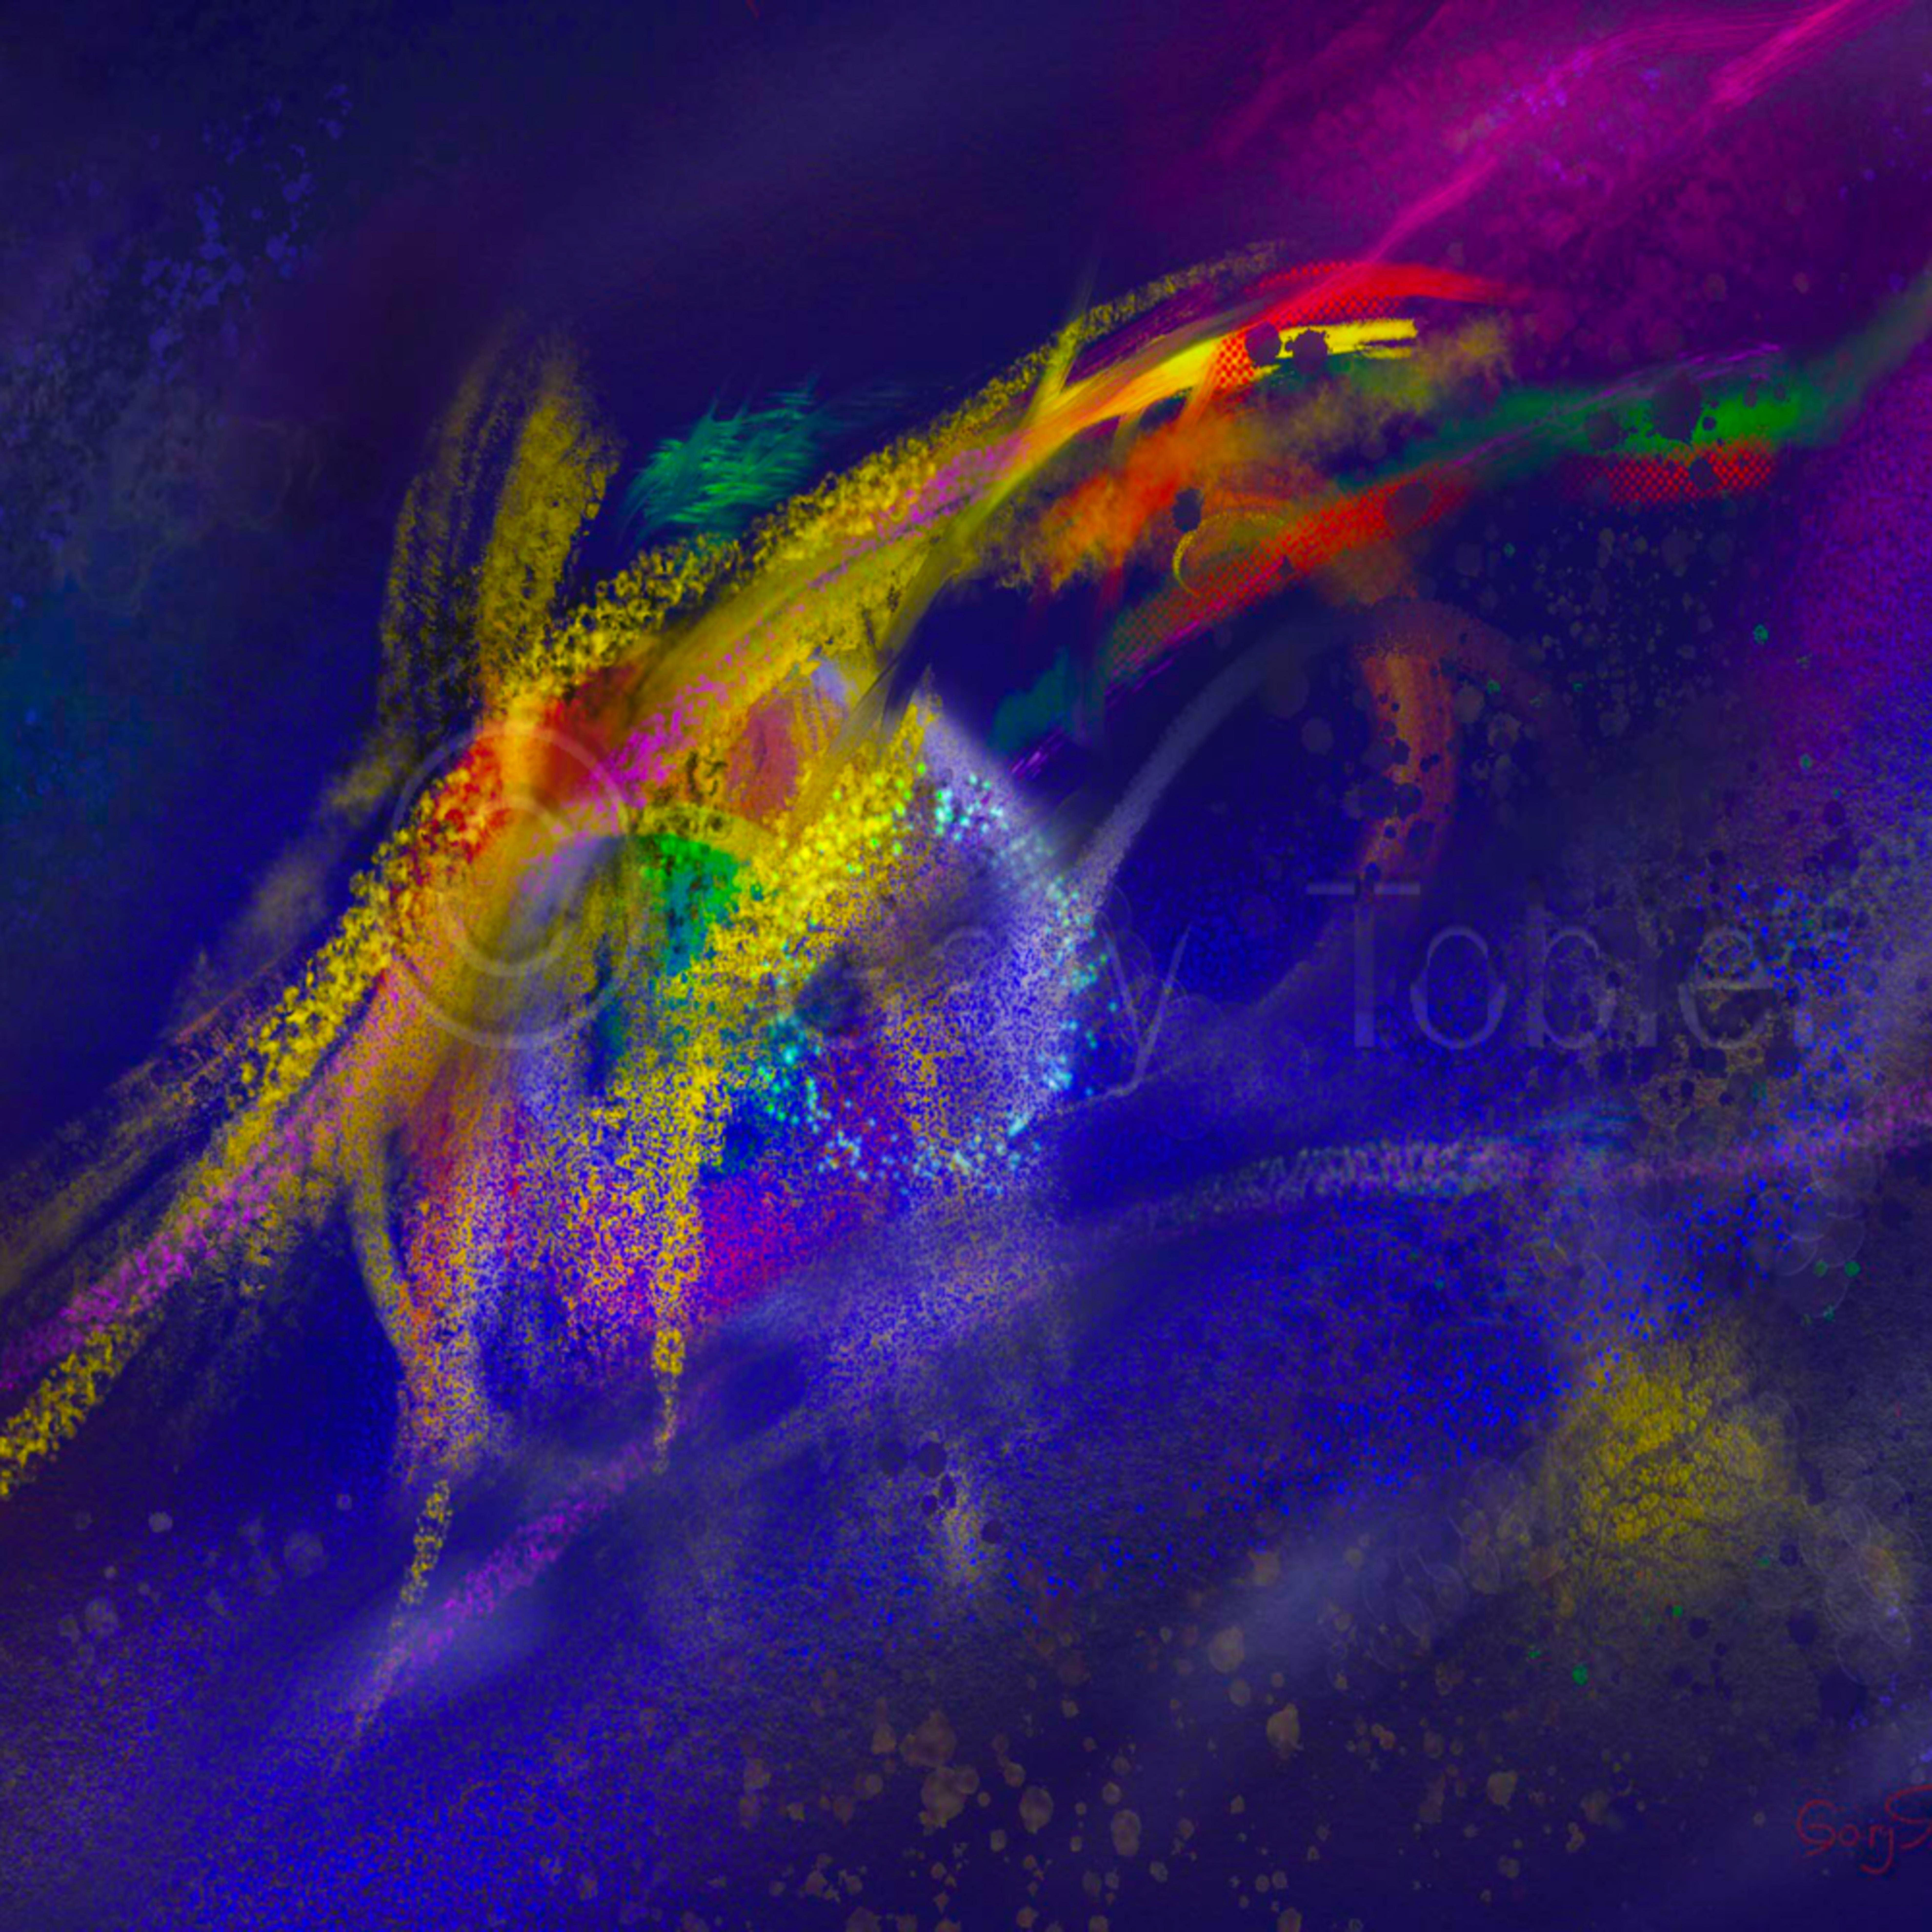 Yellow dragon r1rsf3